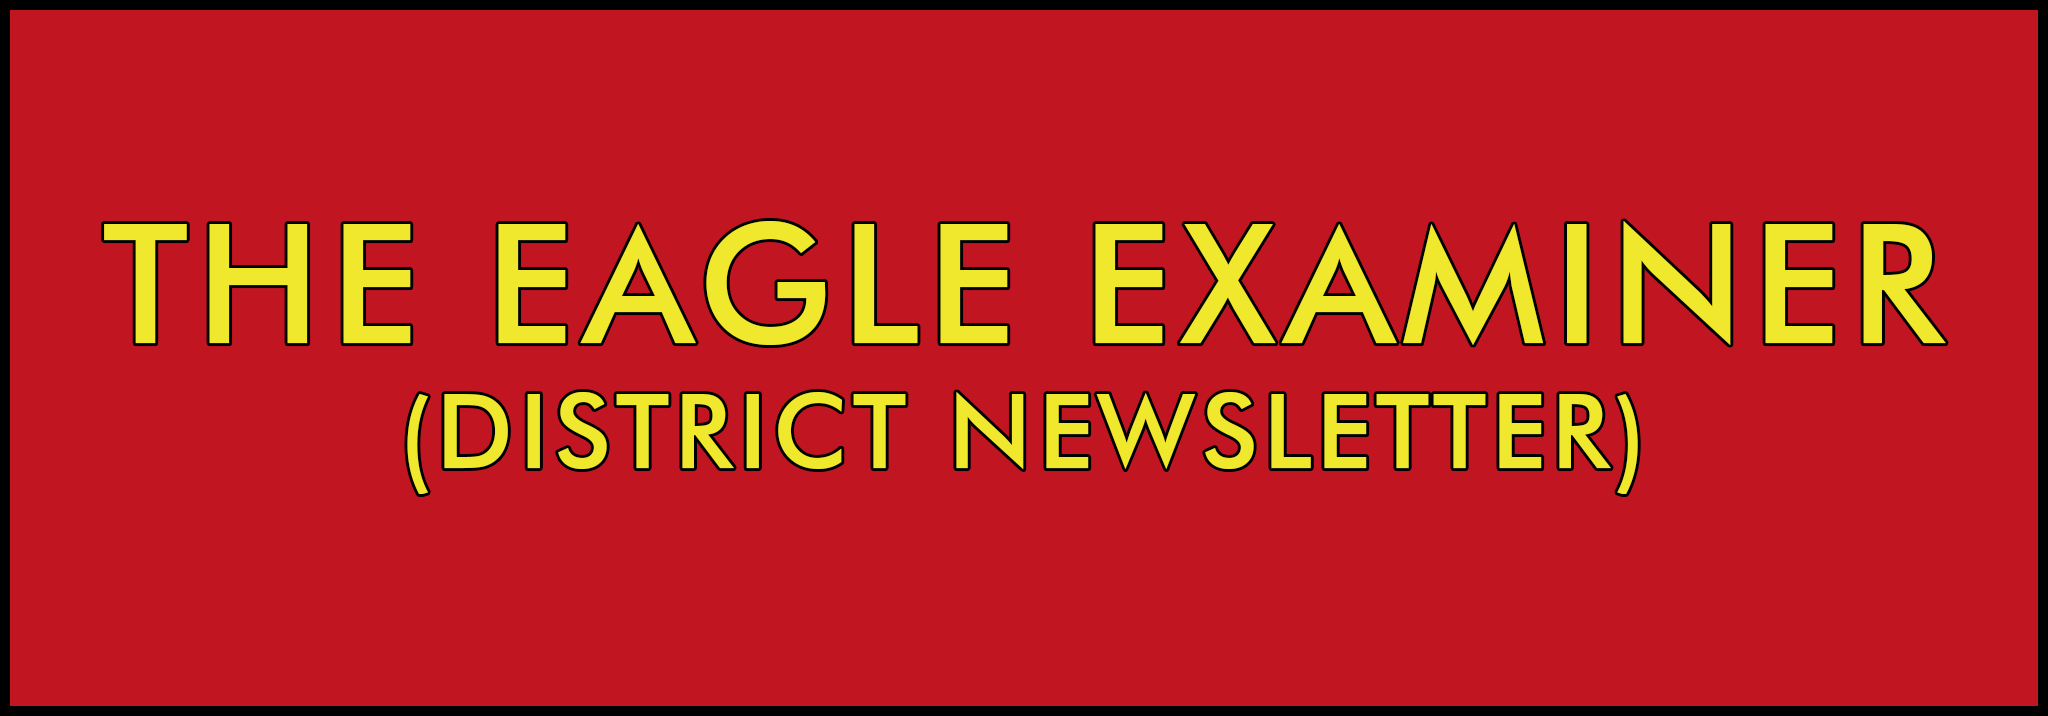 The Eagle Examiner